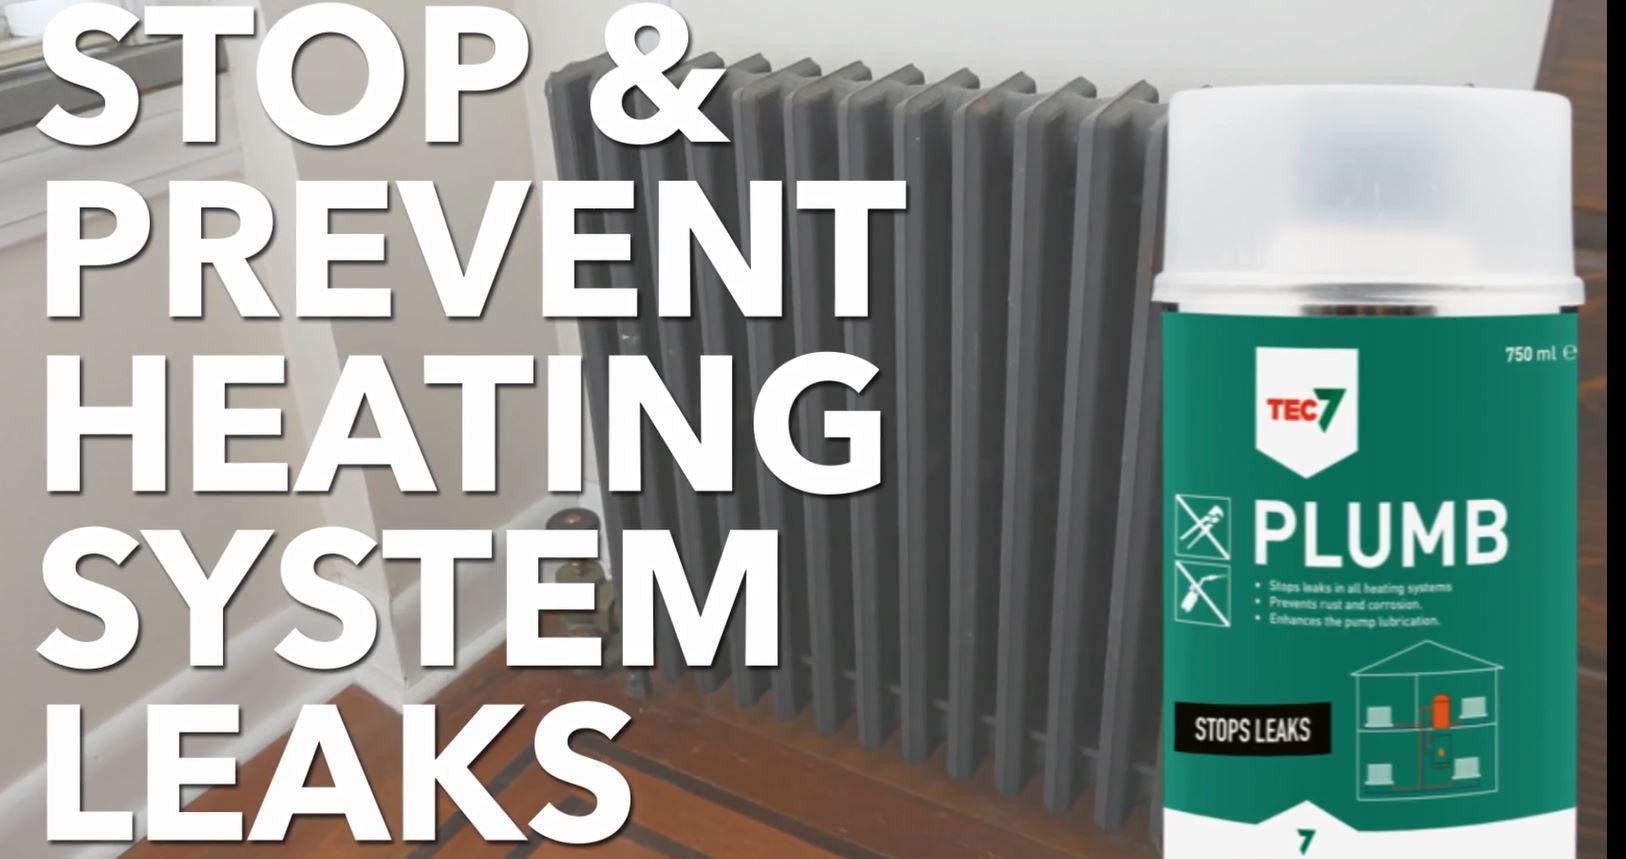 Tec7 Plumb – Stops & Prevents Heating System Leaks